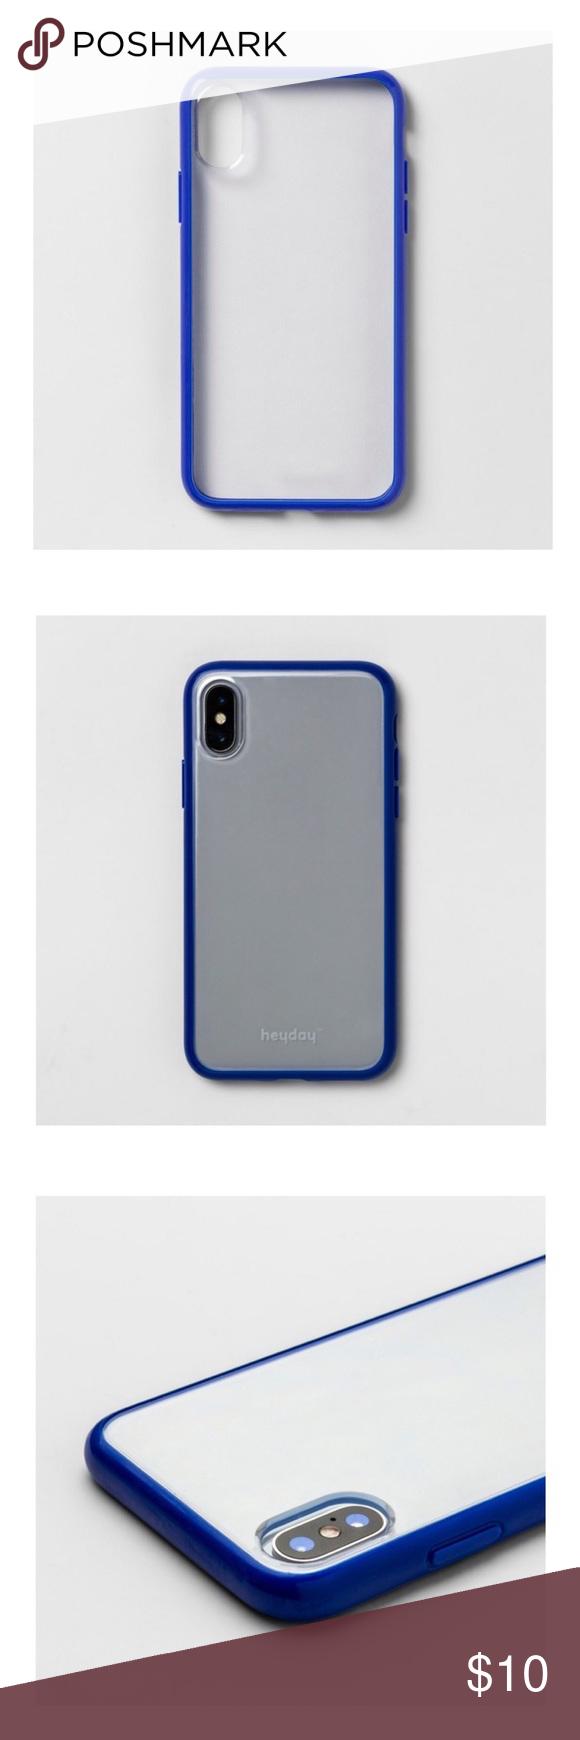 New Apple Iphone X Clear Case W Bumper Frame Phone Case Accessories Clear Cases Apple Iphone